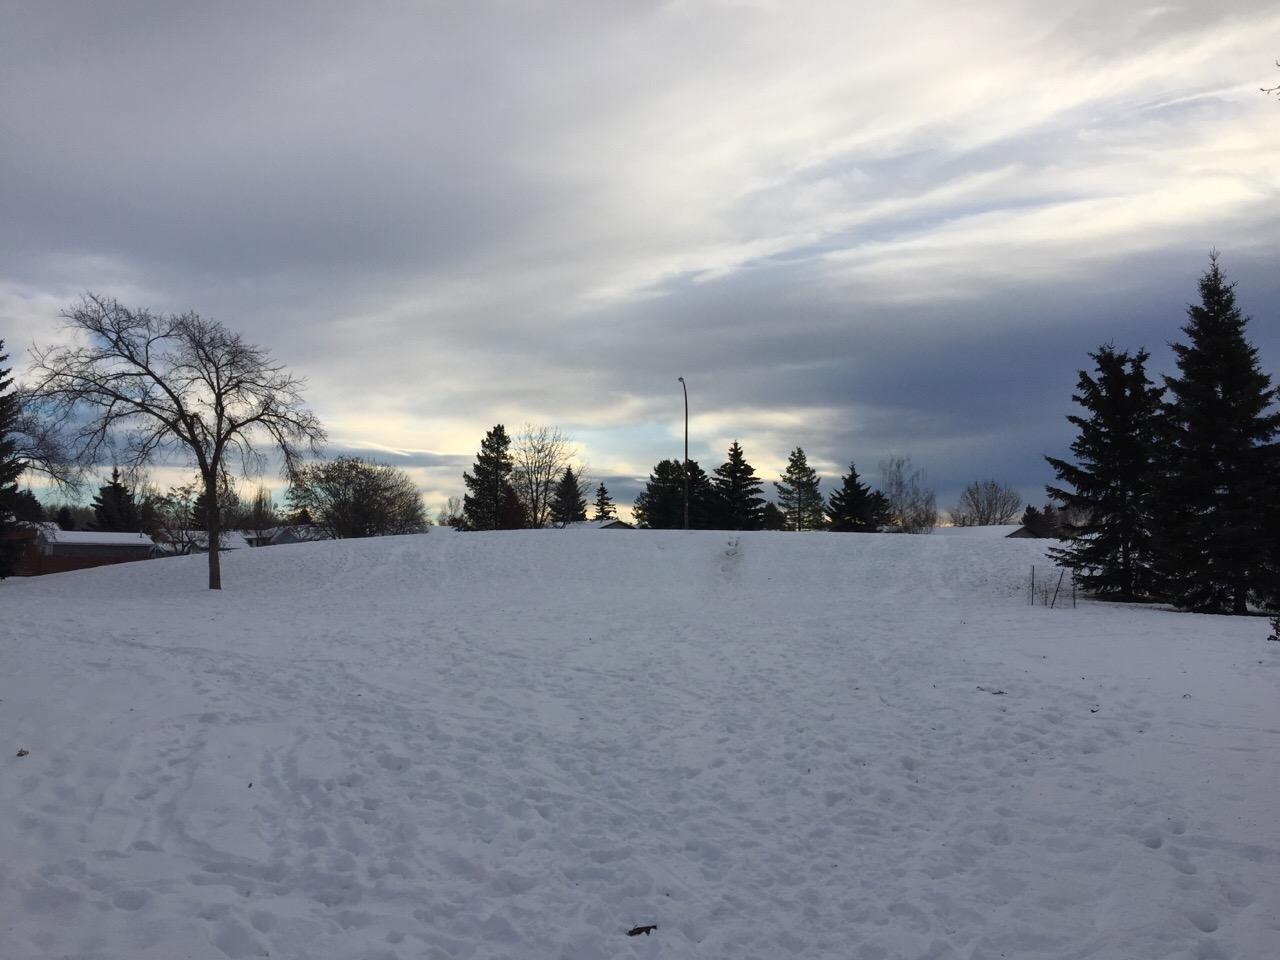 Adair Family Park